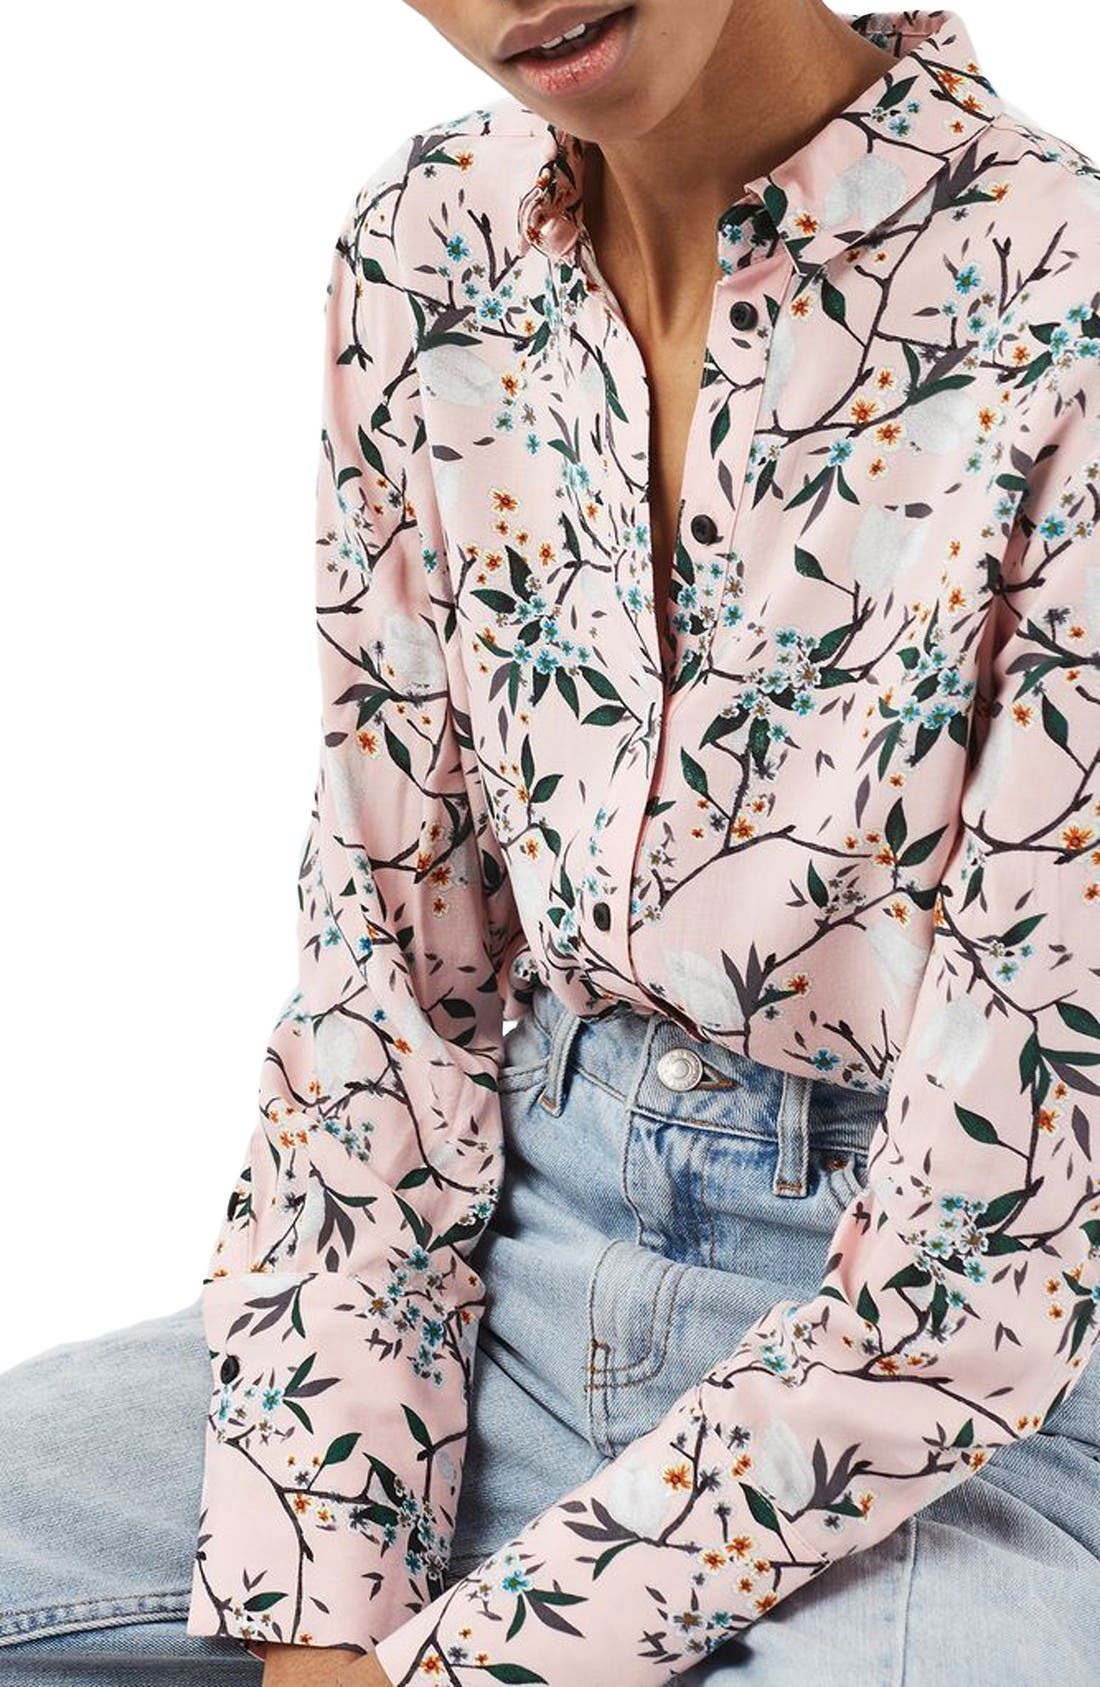 TOPSHOP Cherry Blossom Shirt